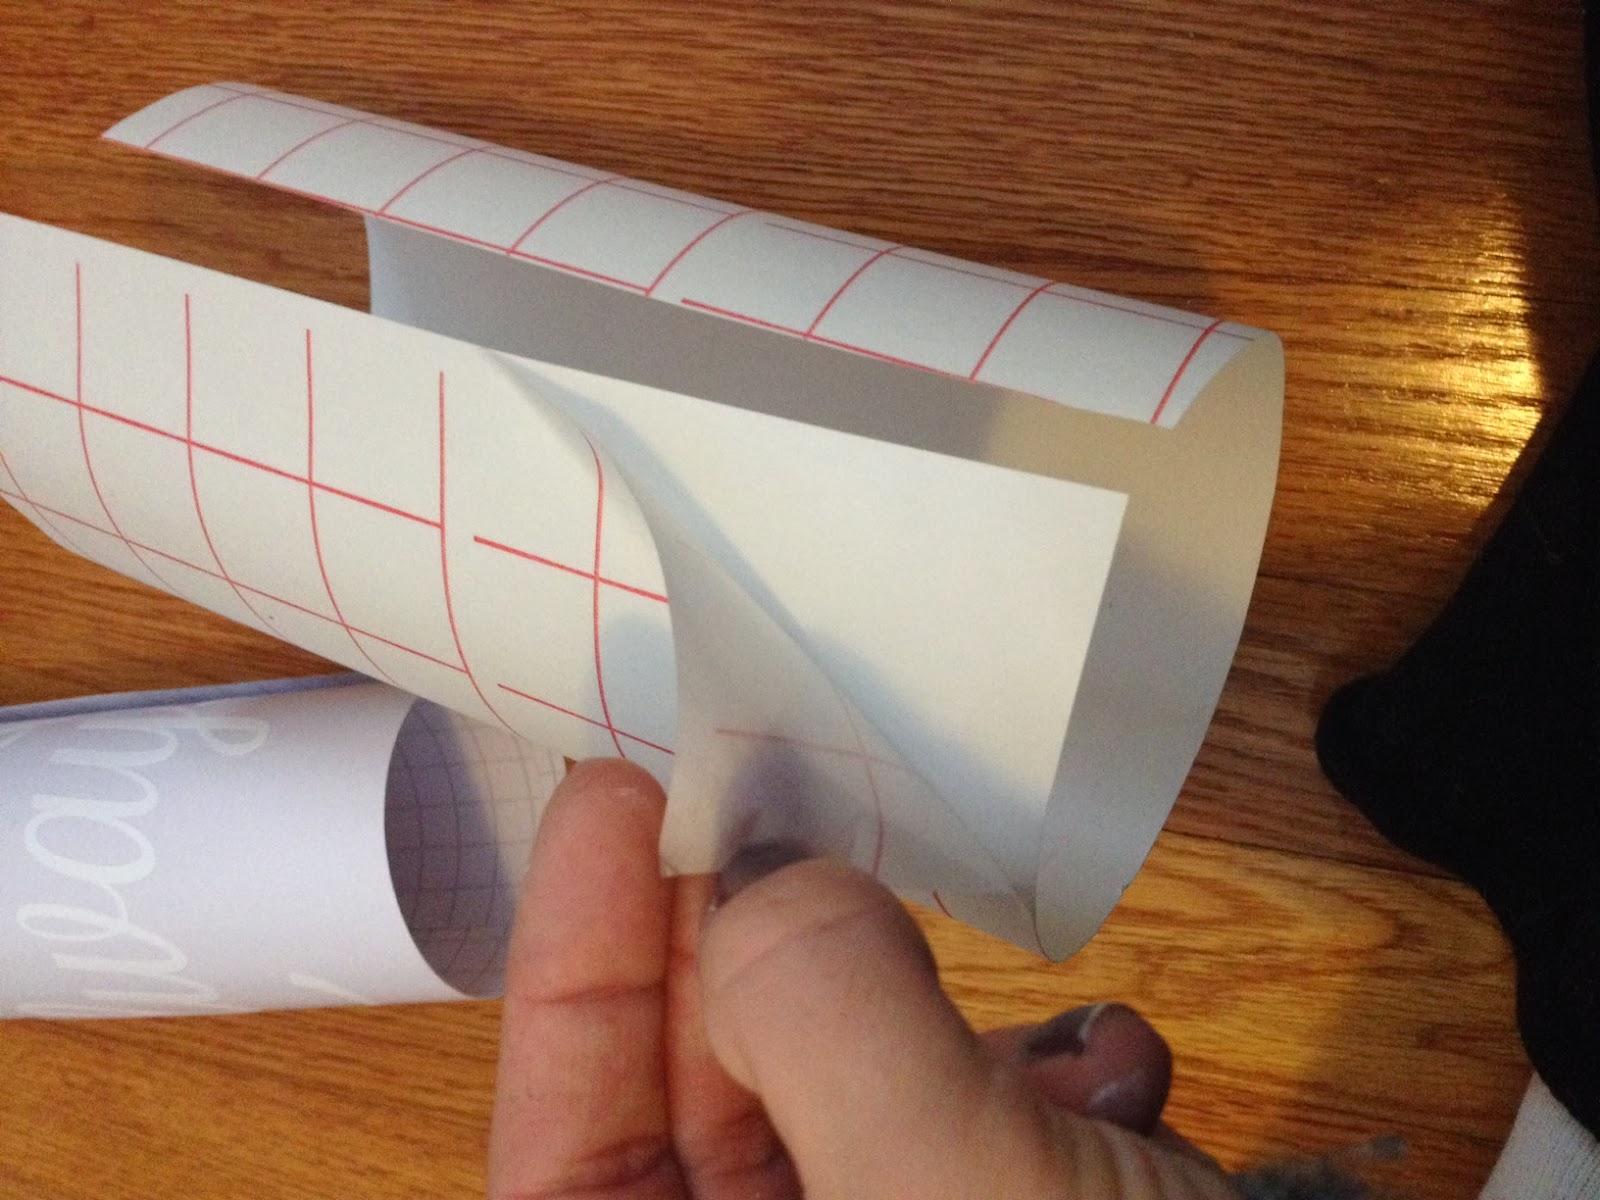 Silhouette CAMEO, Silhouette Portrait, Silhouette vinyl, how to cut vinyl, how to cut vinyl with silhouette cameo, grid transfer paper